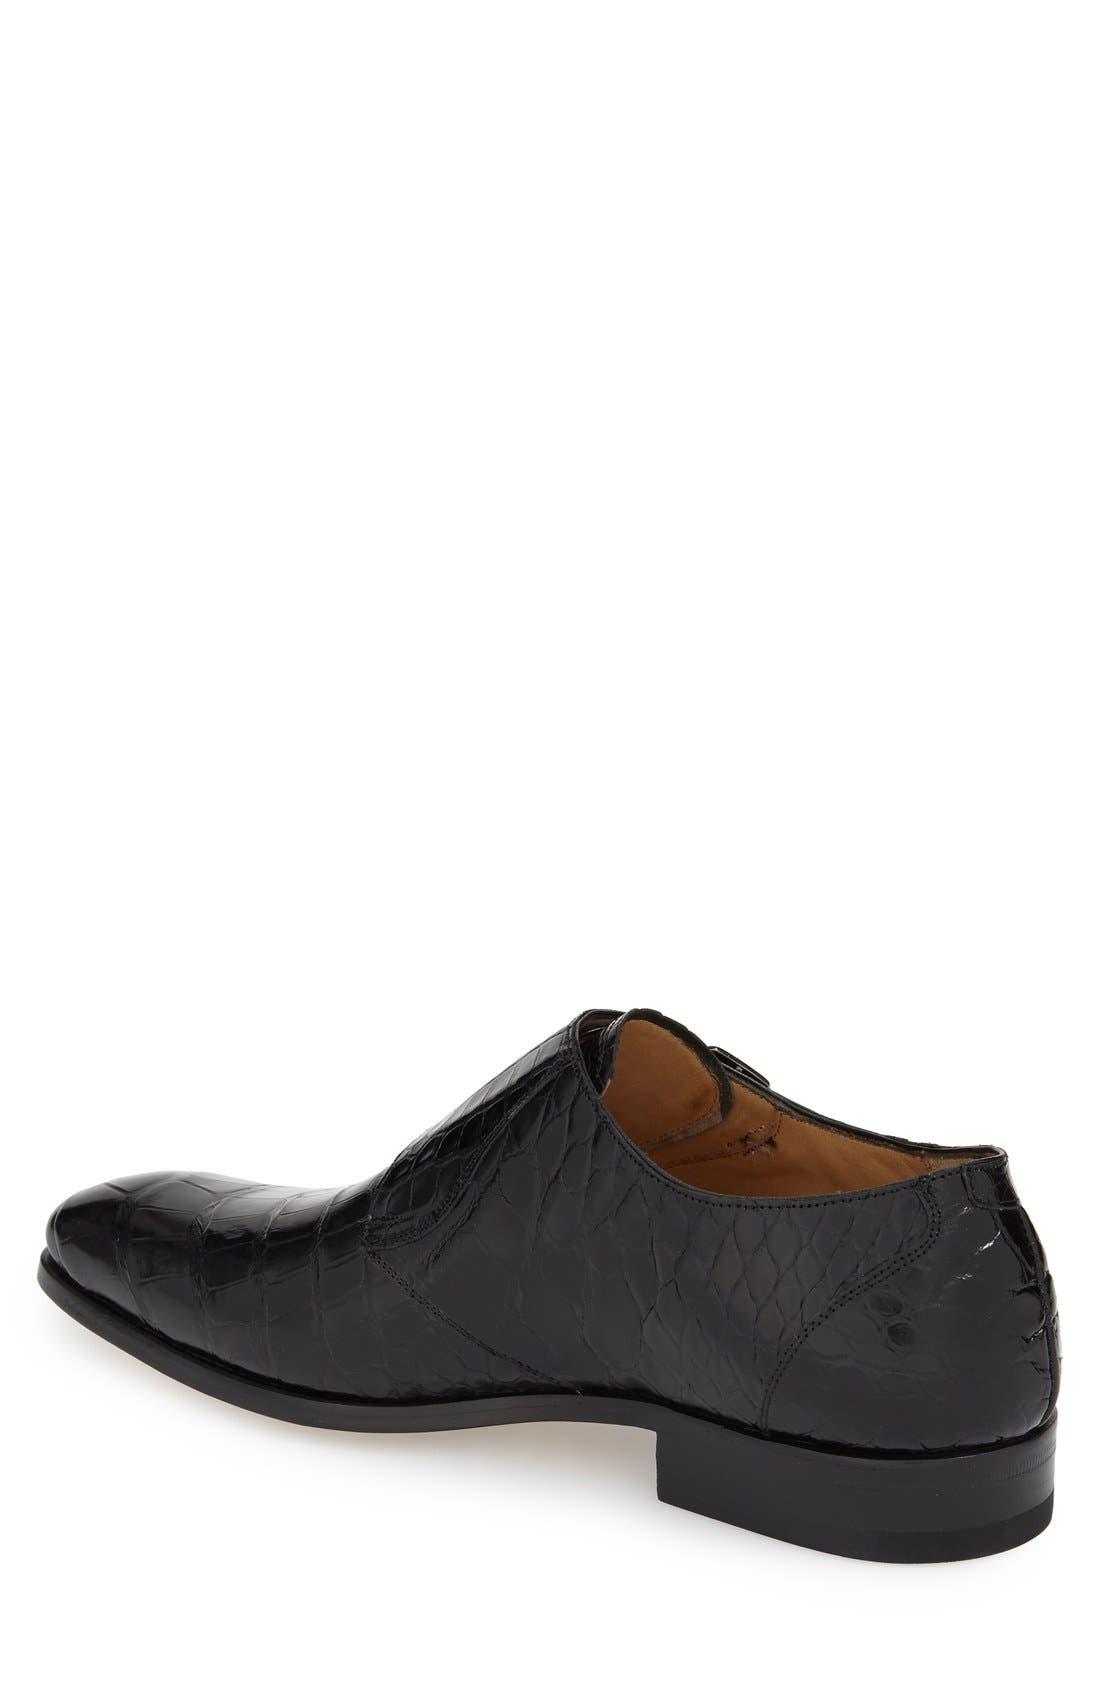 Alternate Image 2  - Mezlan 'Agra' Double Monk Strap Shoe (Men)